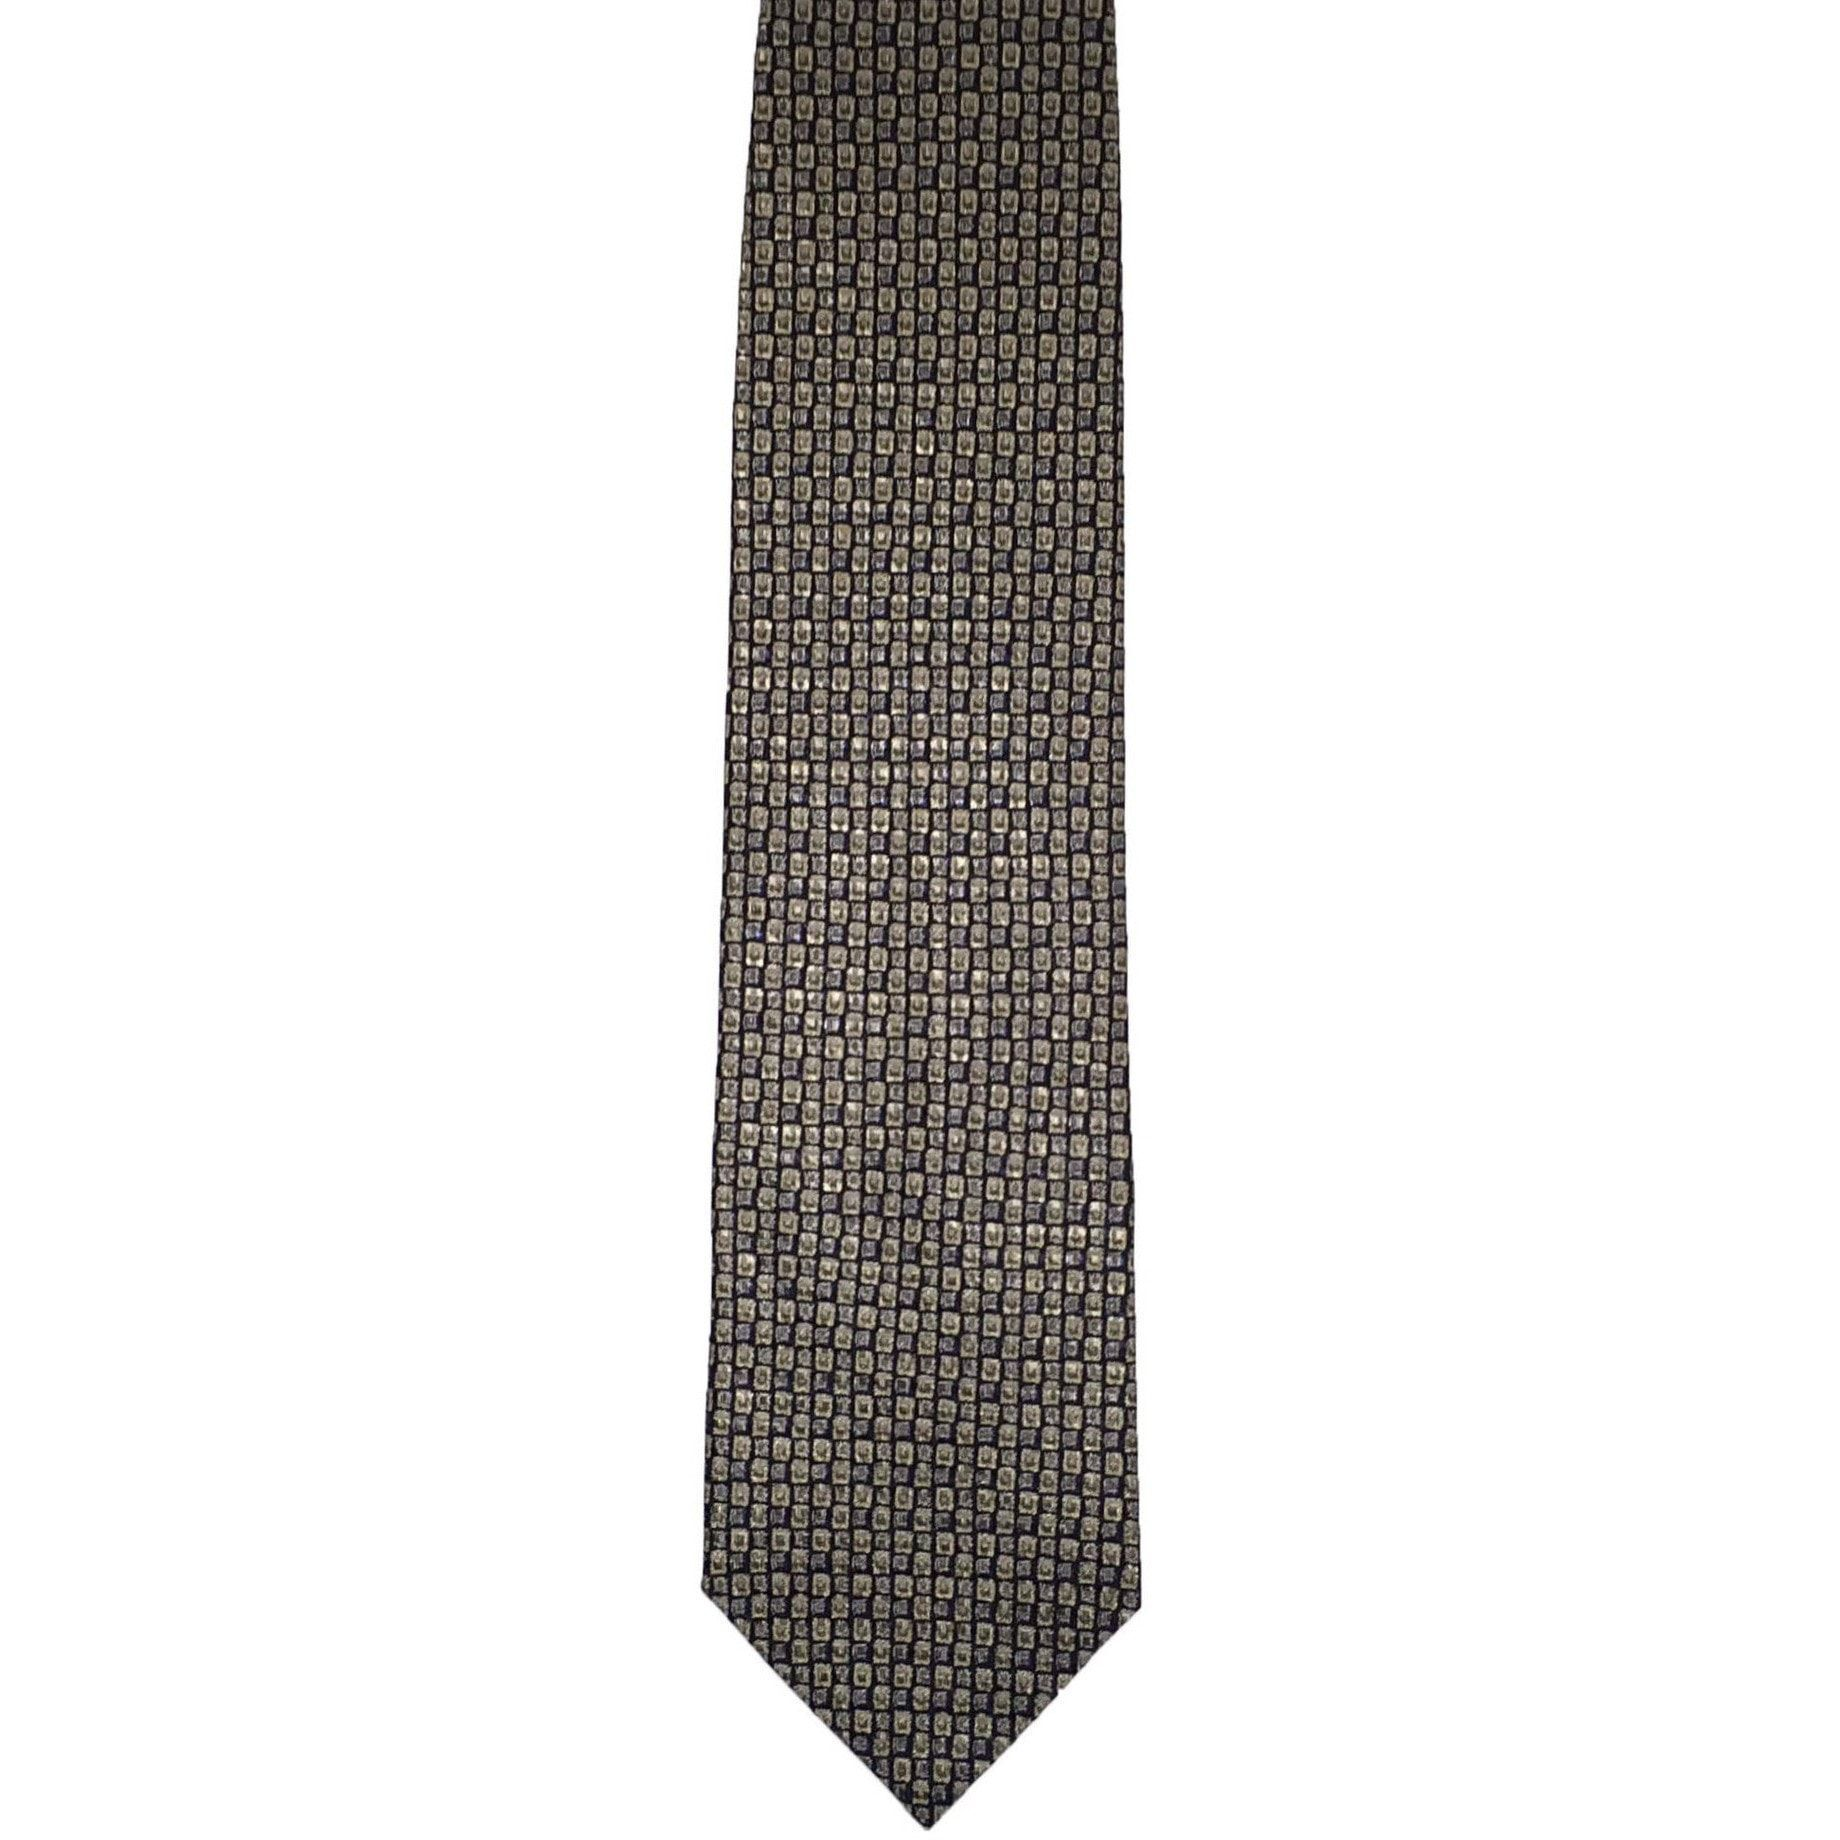 Daniel De Fasson Designer Foulard Wide Silk Tie - Multicolor ...